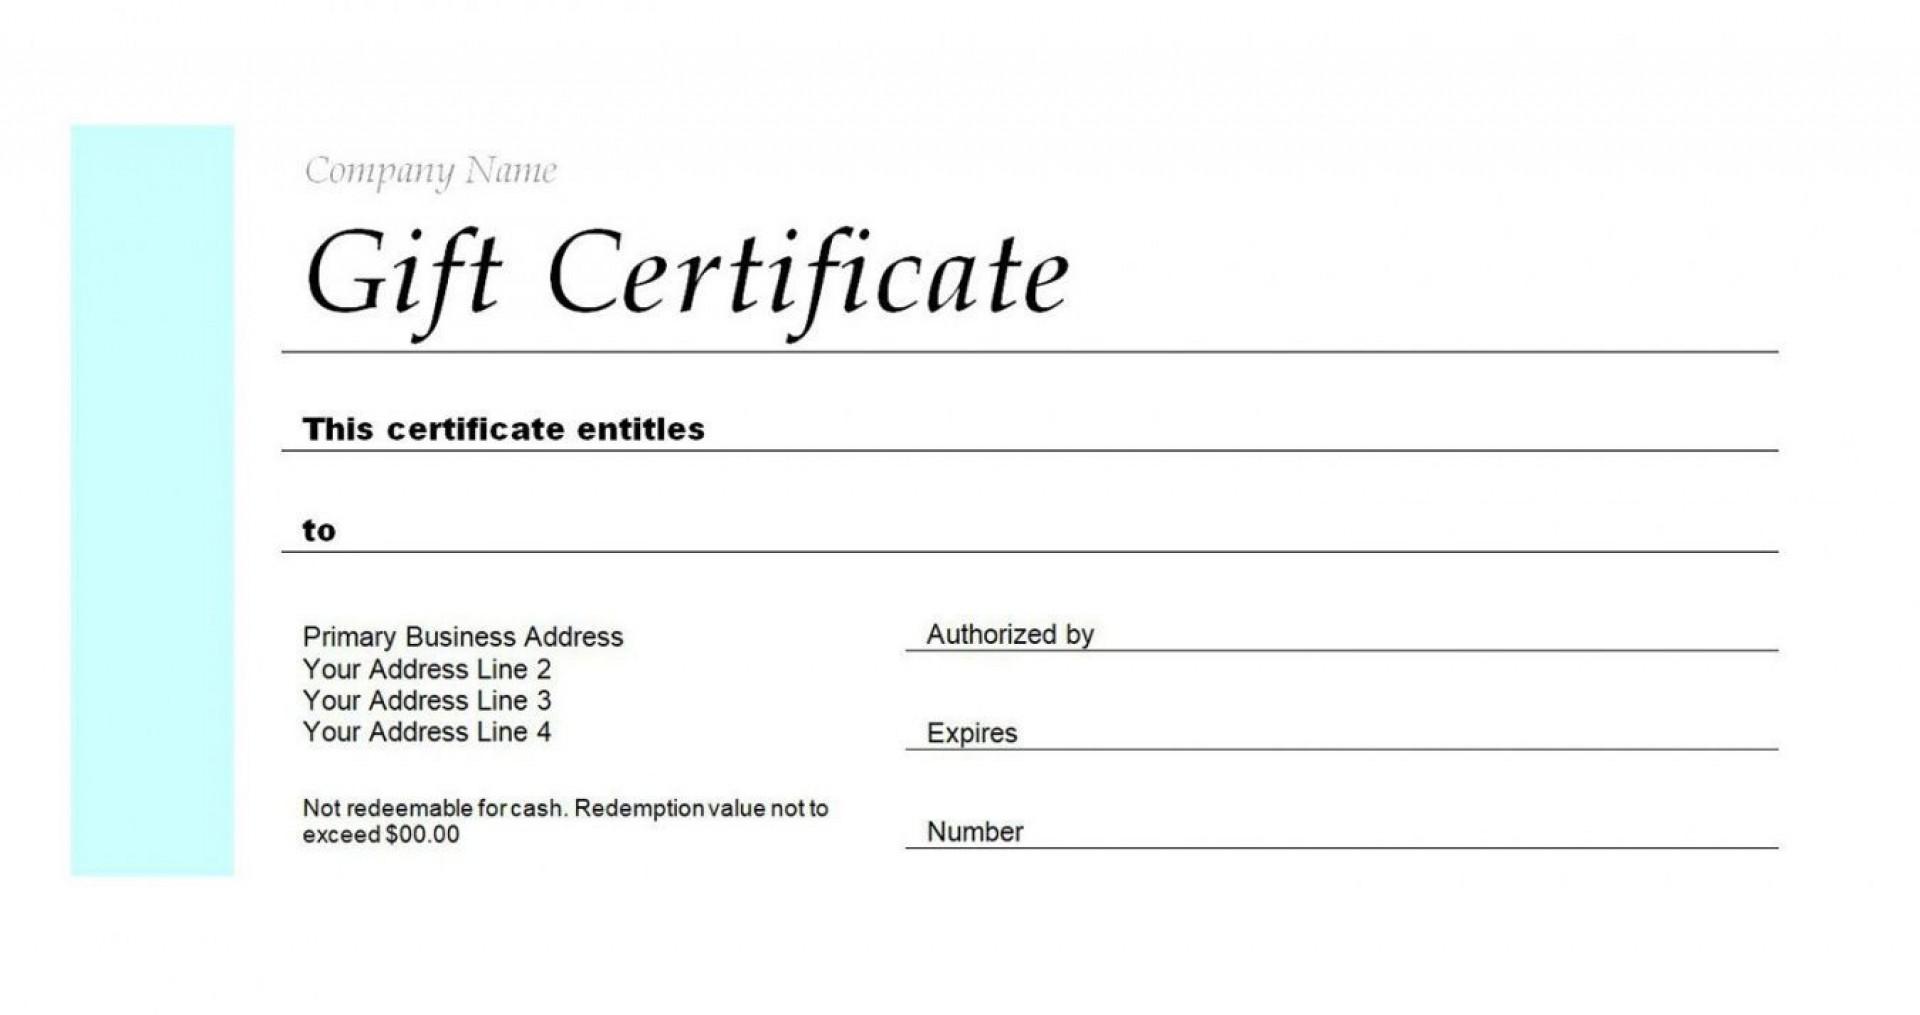 003 Formidable Gift Certificate Template Pdf Inspiration  Massage Christma Printable1920